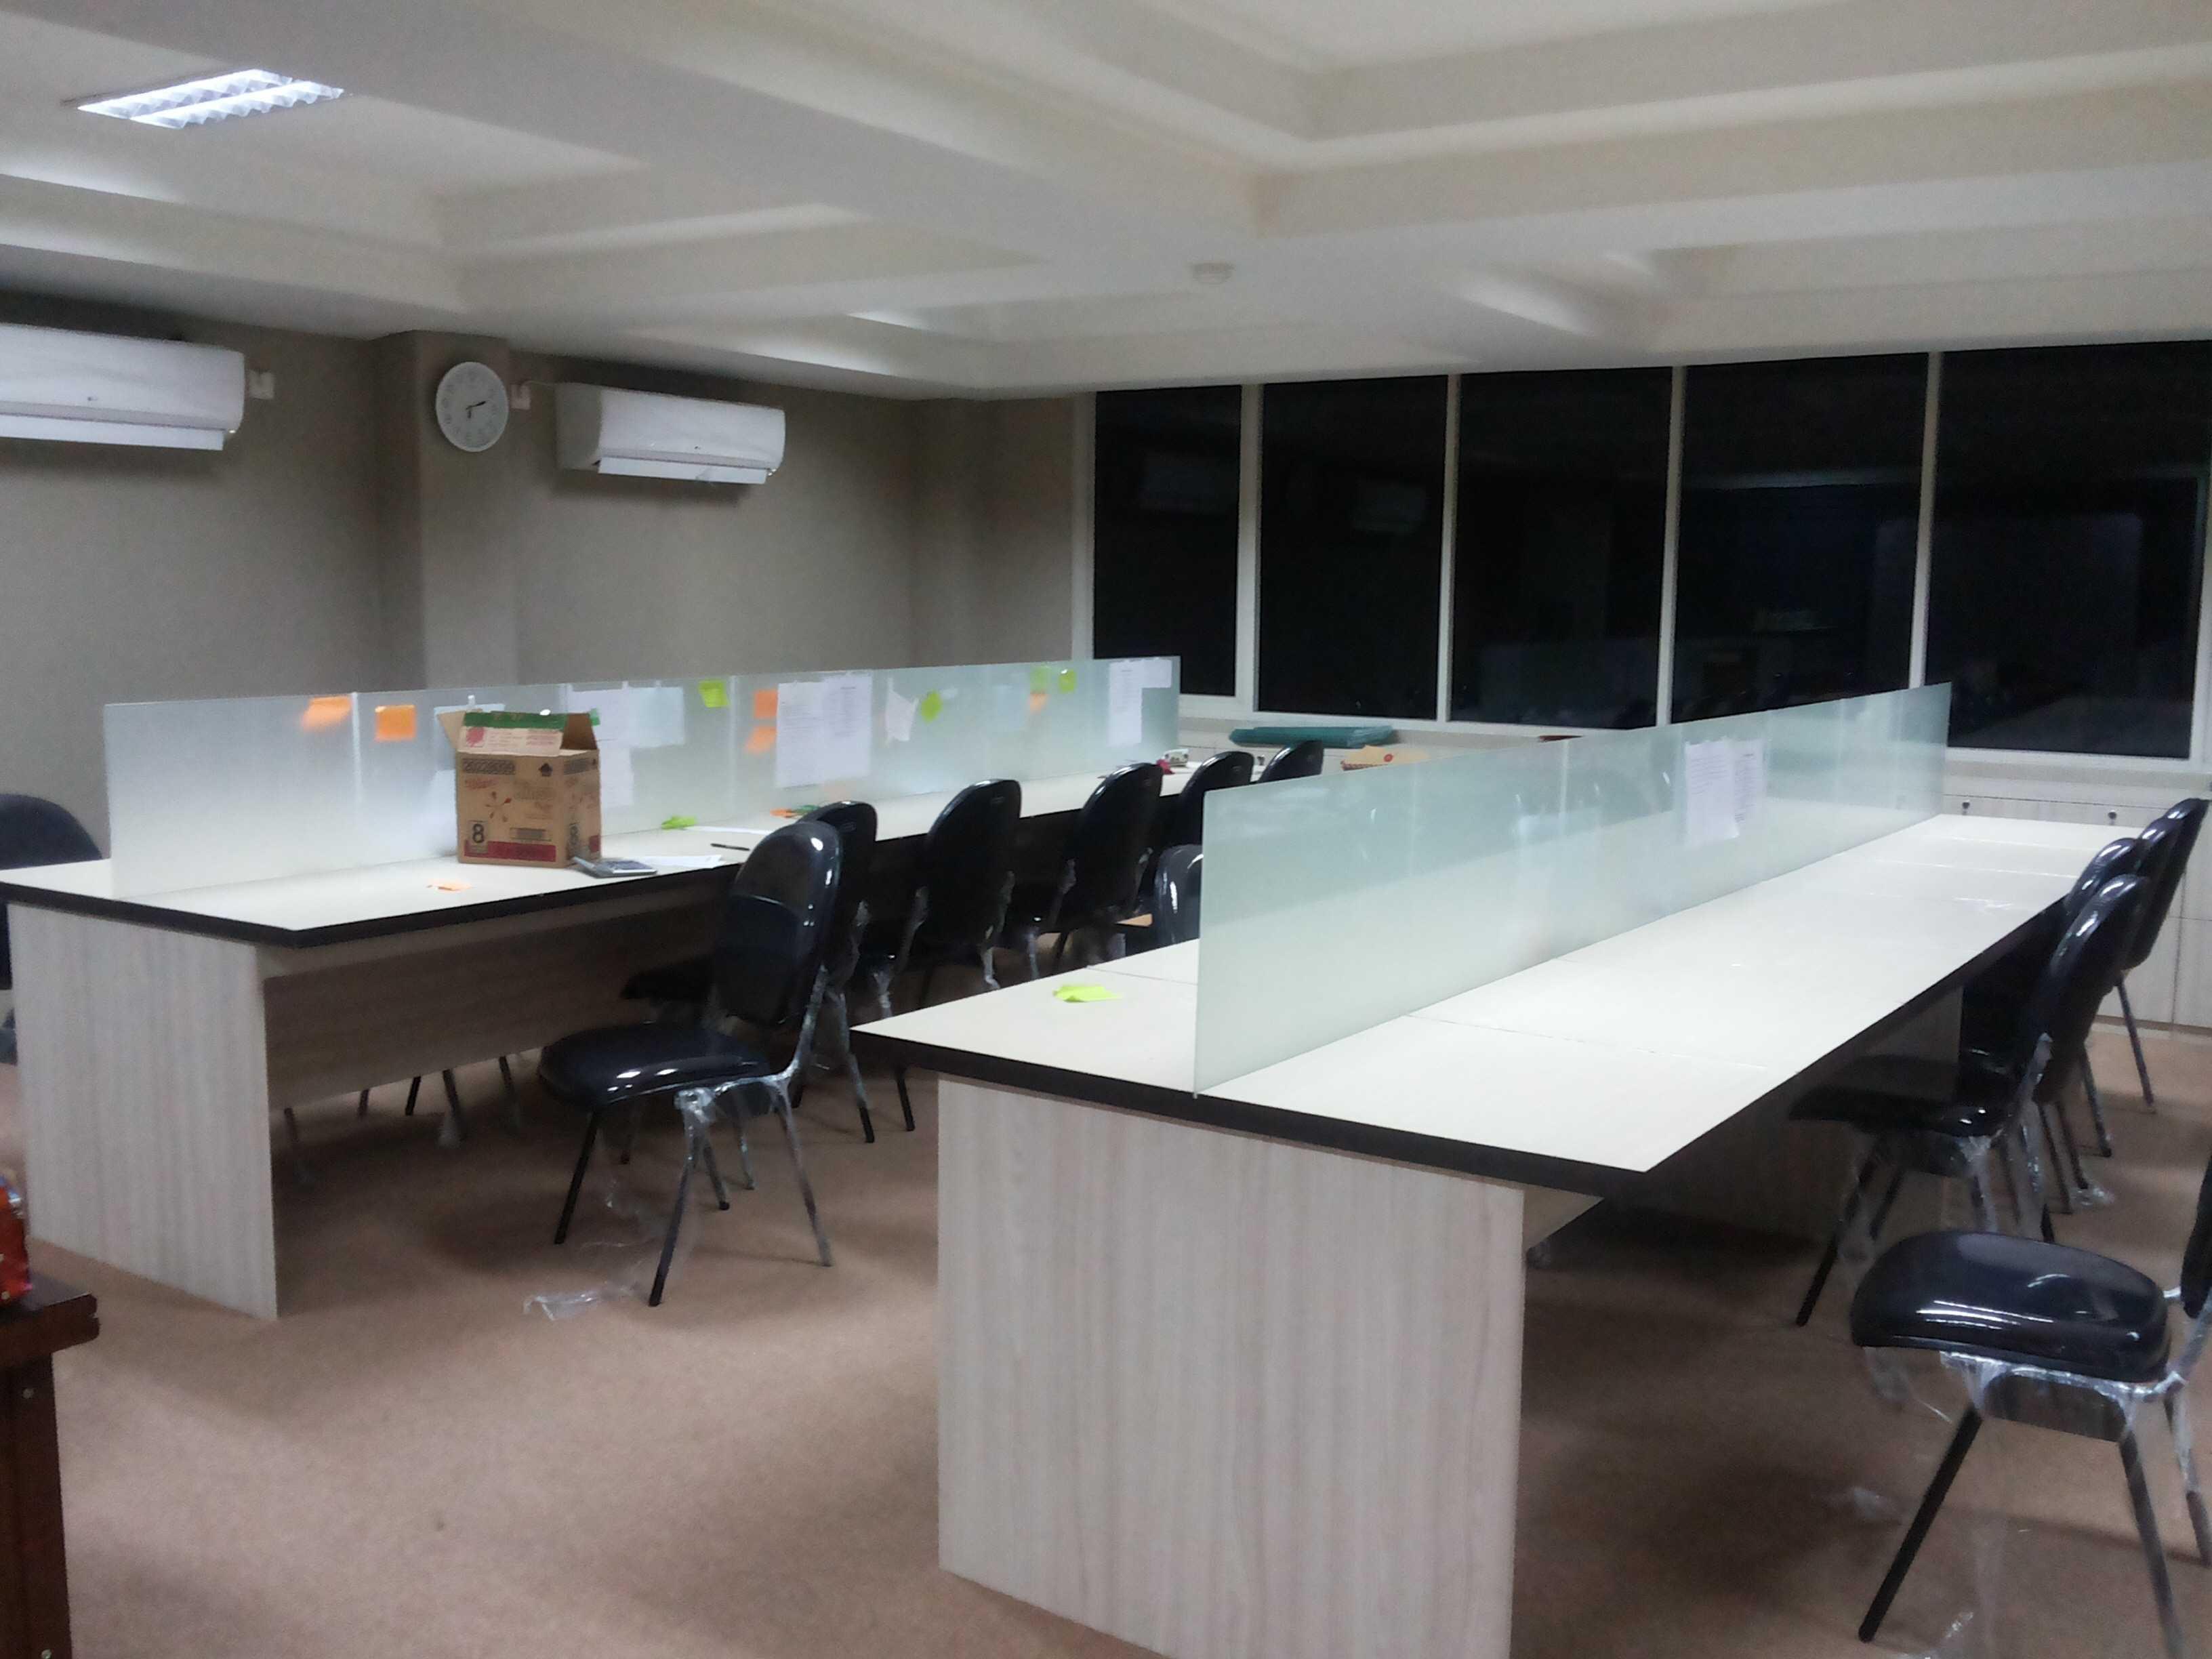 Arliocta Anggaravony Office Telemarketing Depok City, West Java, Indonesia Jln Kelapa Molek 2 Blok Fa 4 No16, Klp. Dua, Tangerang, Banten 15810, Indonesia Img5410 Modern  34365